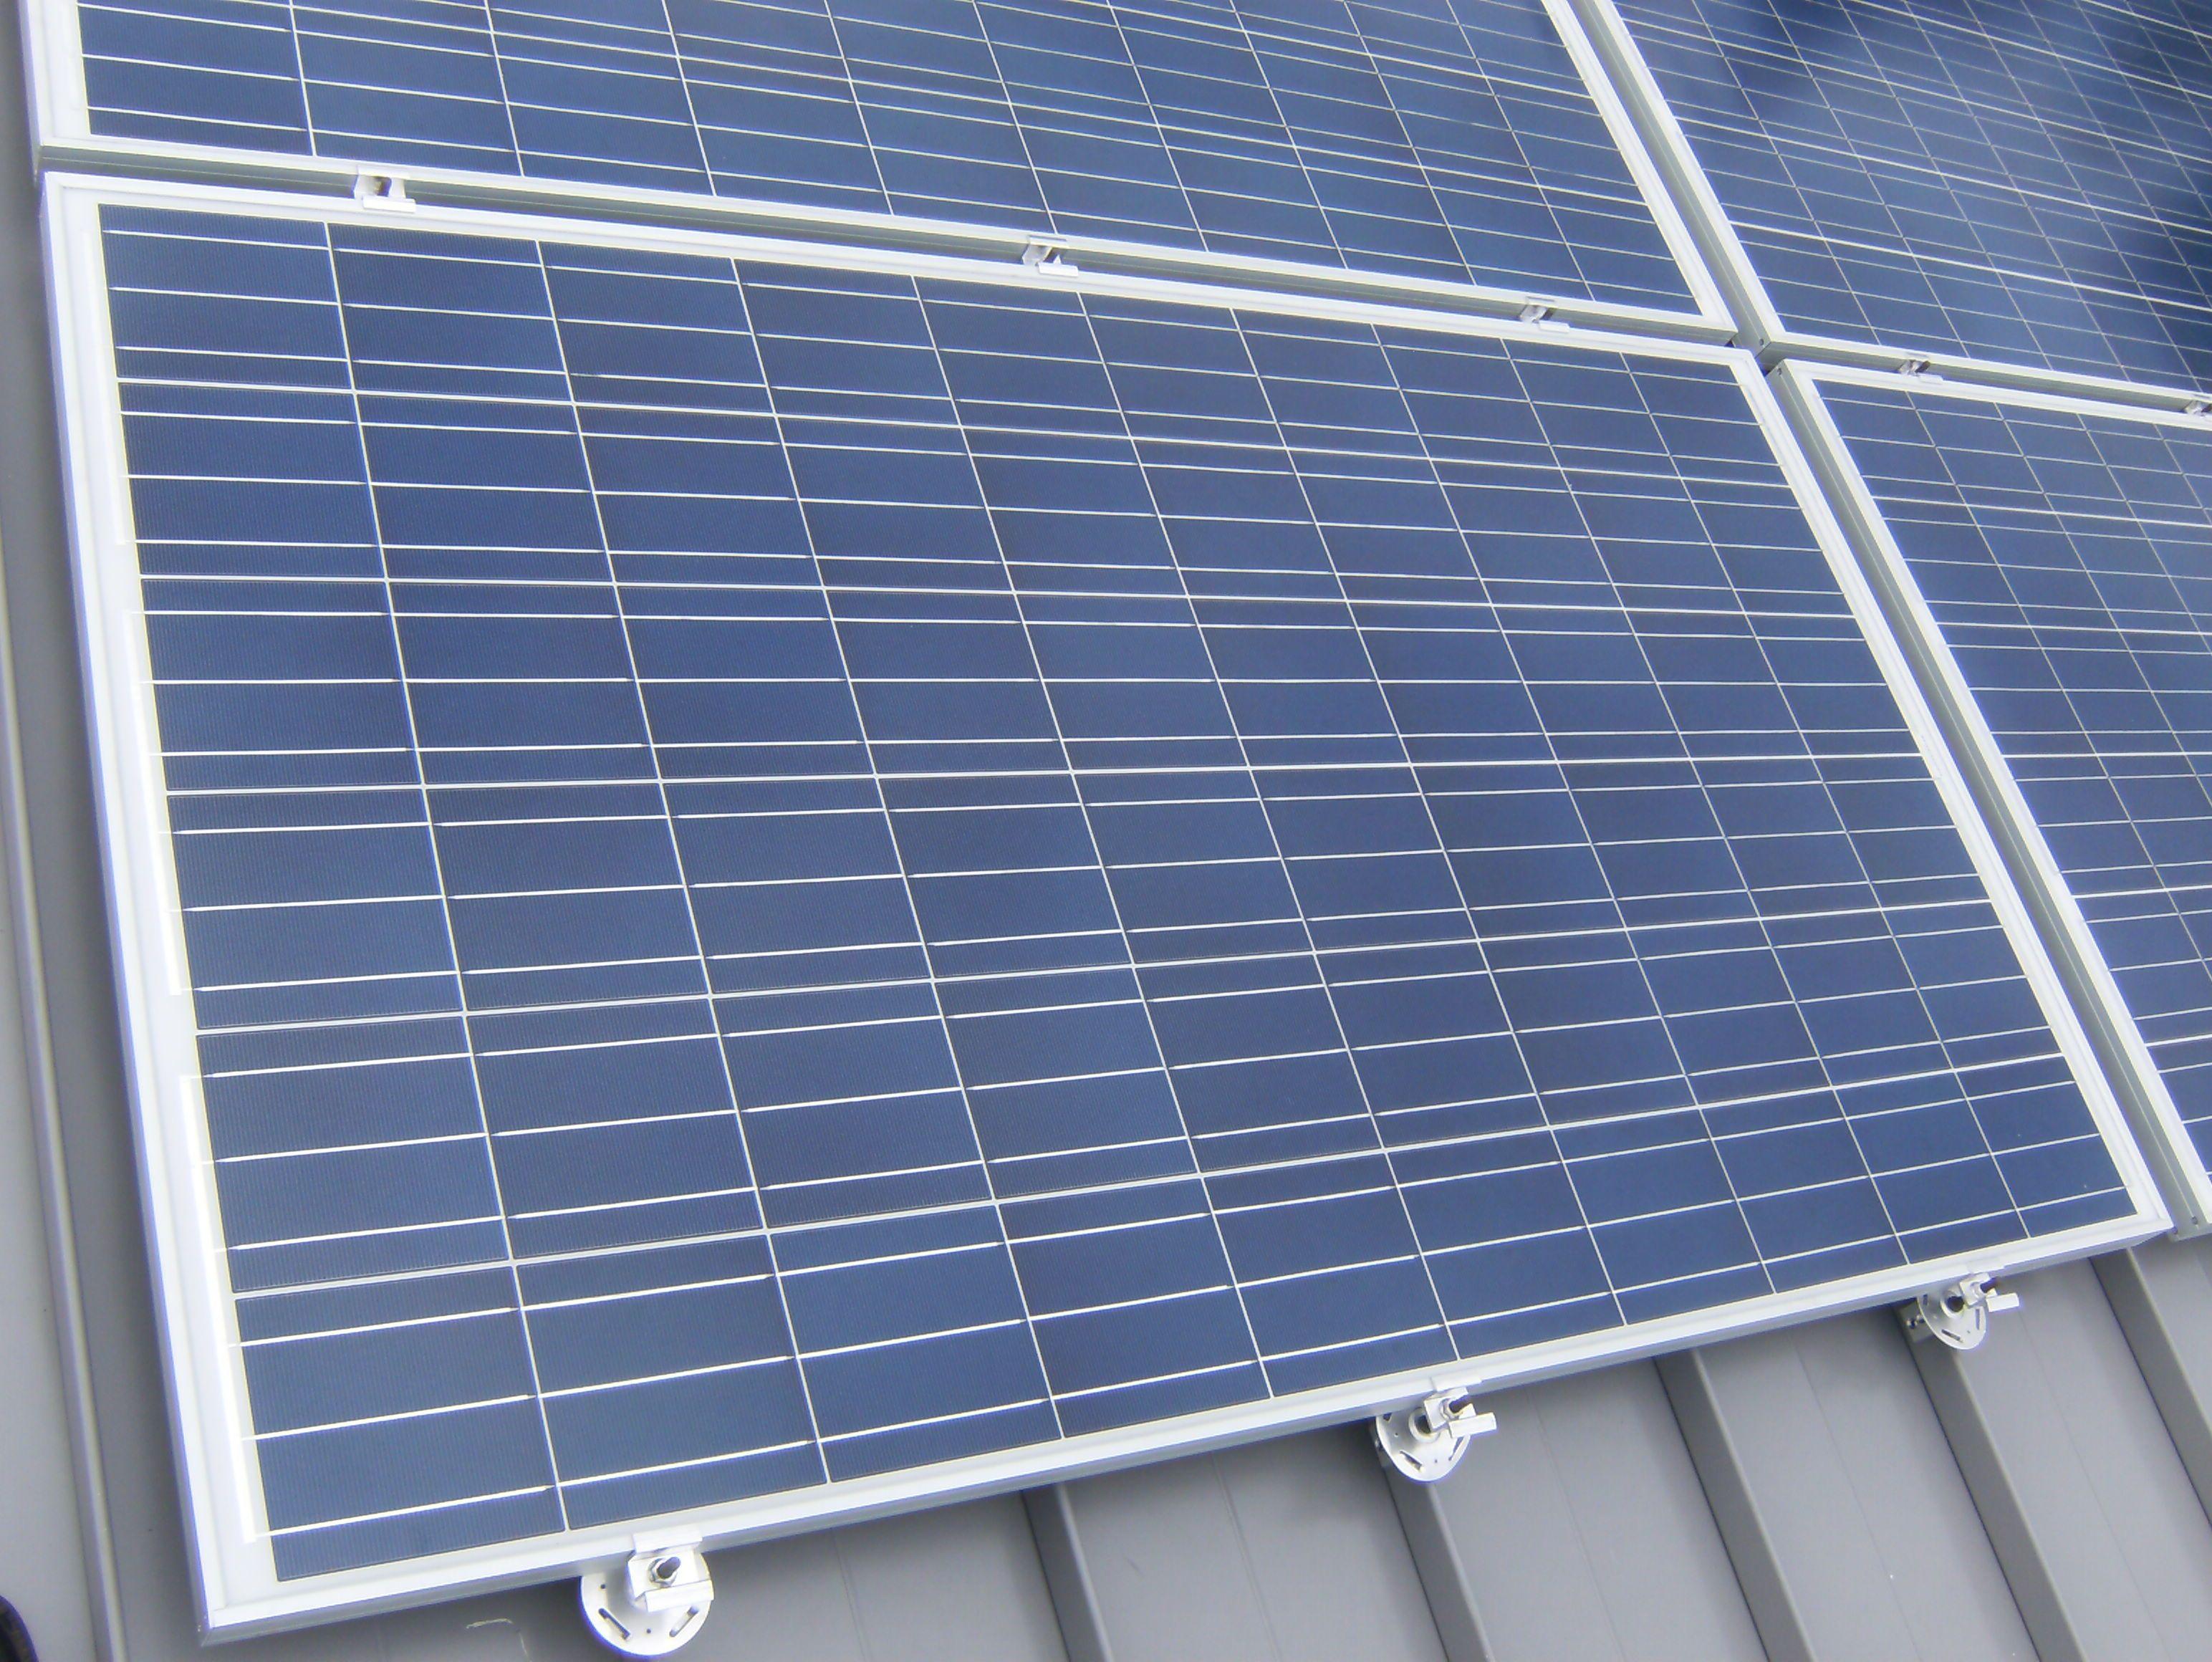 Industrial Metal Roofing With Solar Panels Best Combo Eva